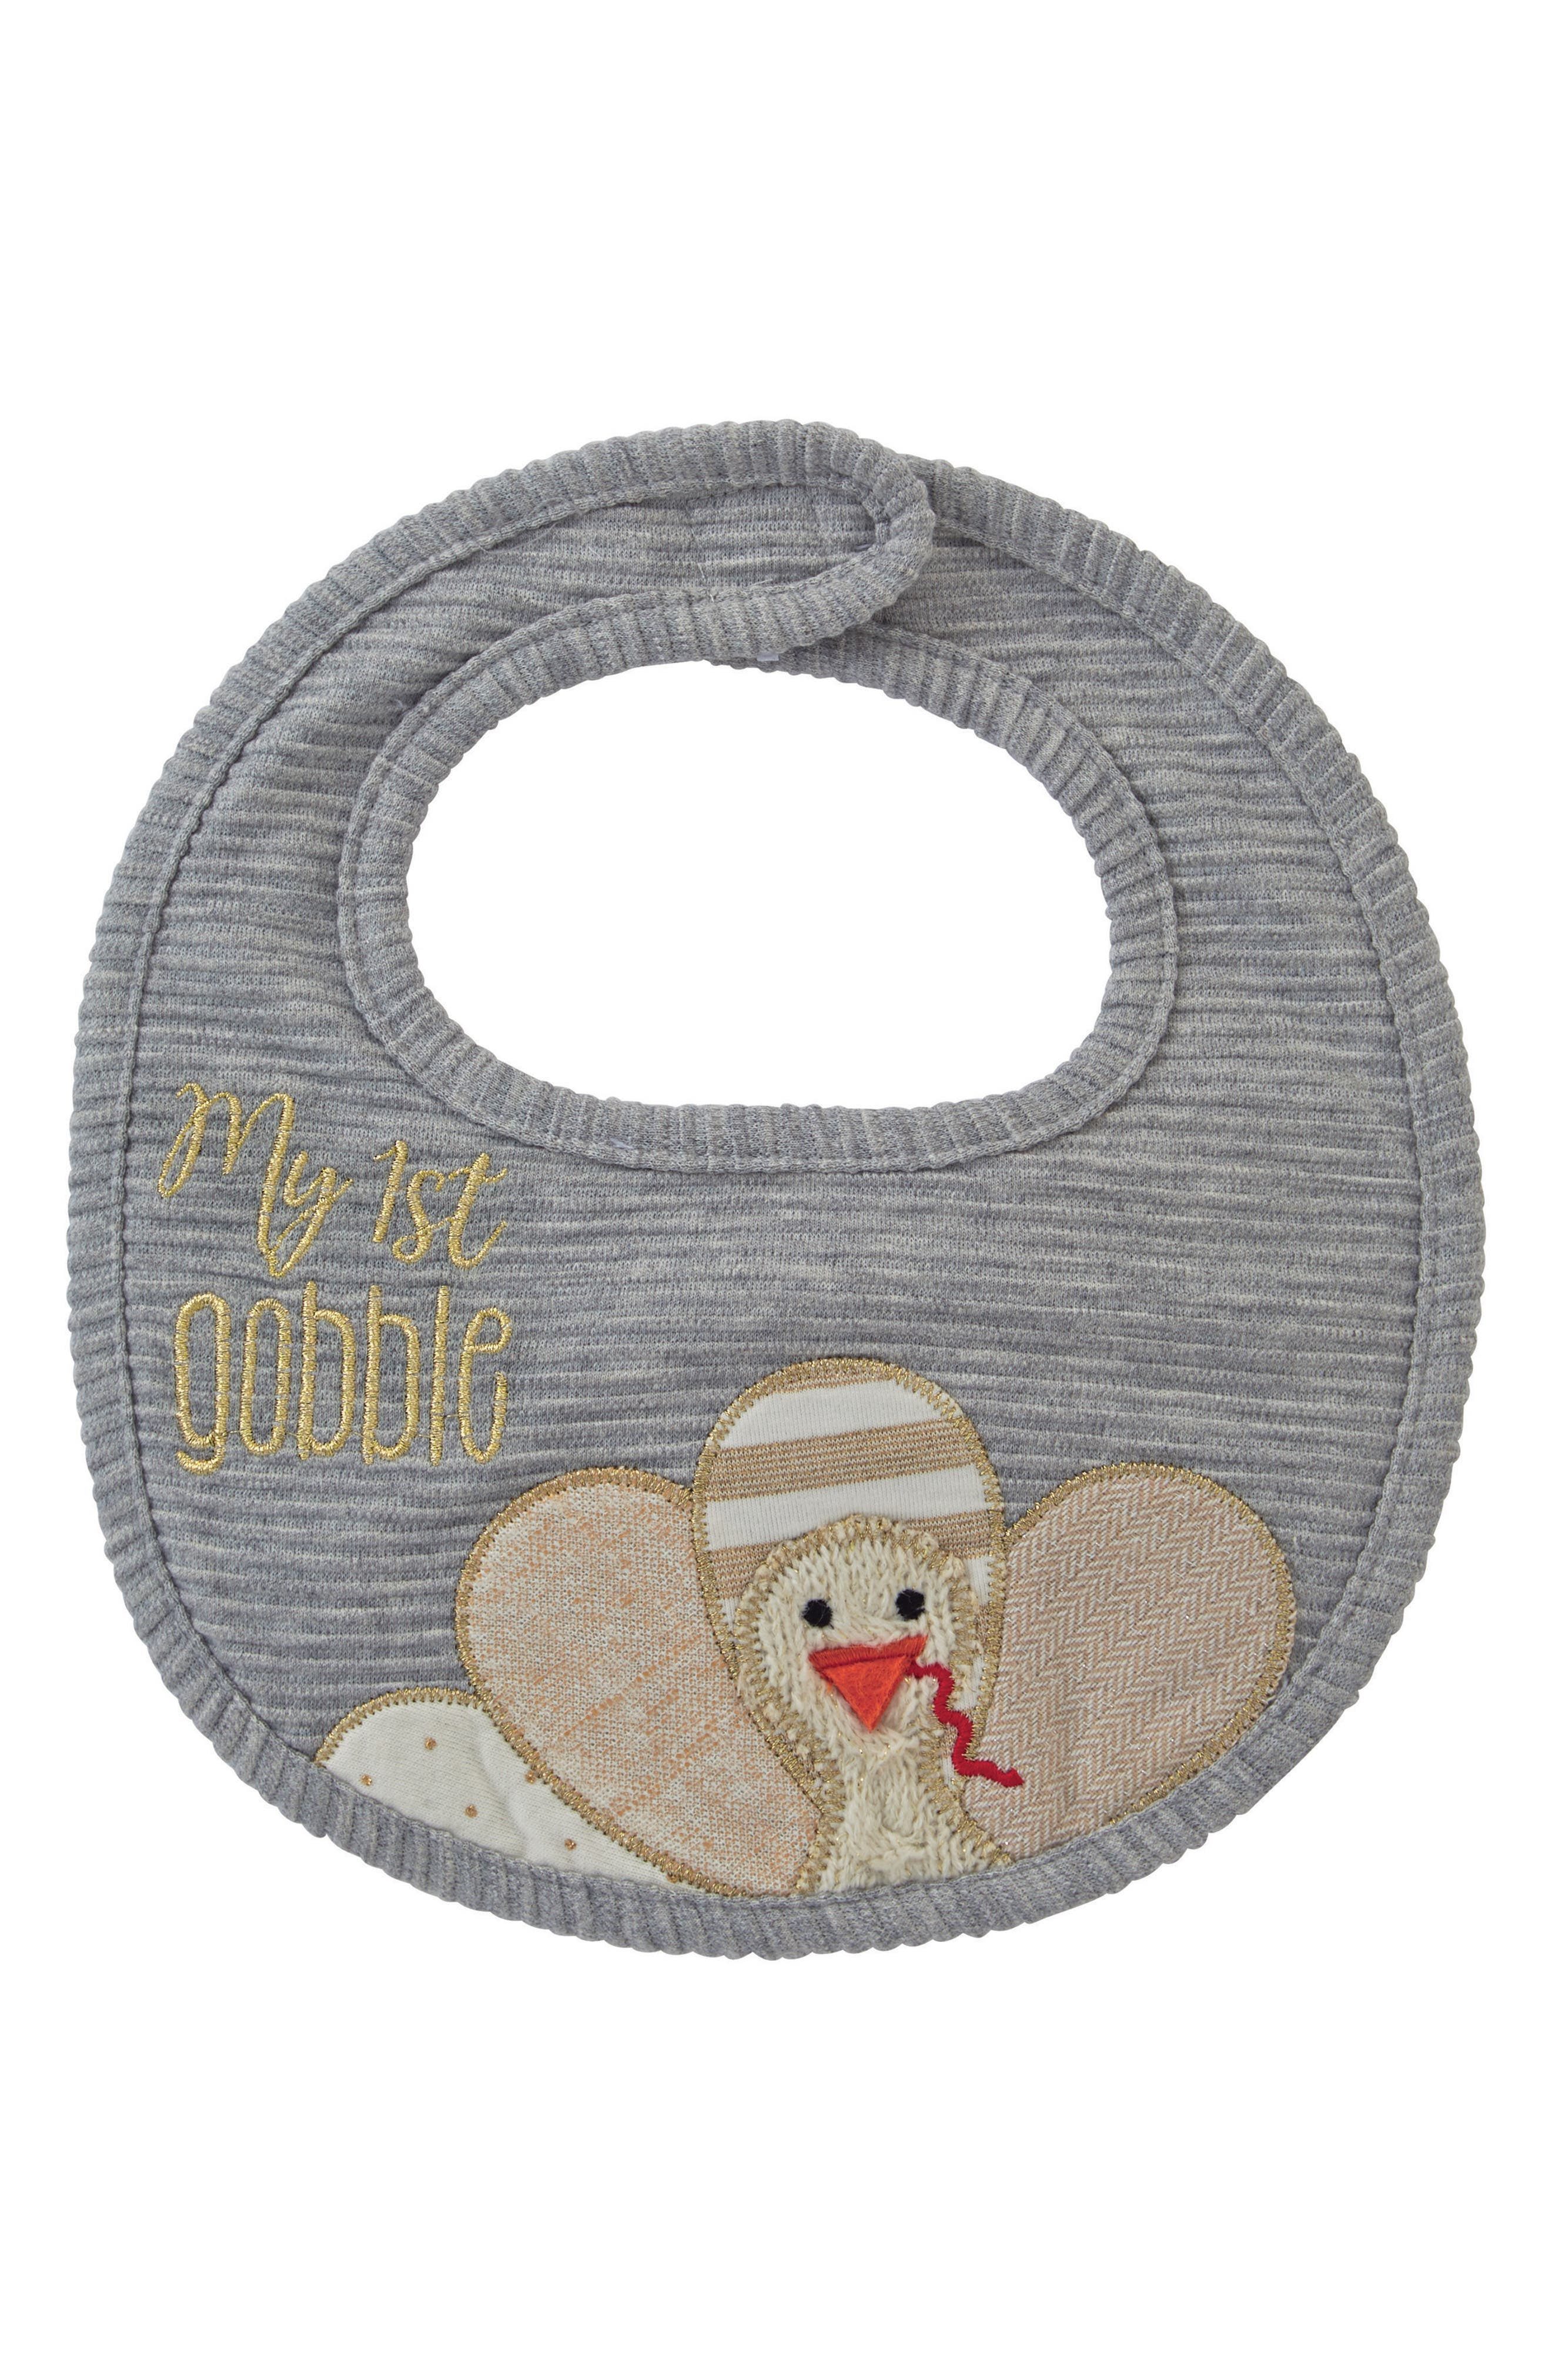 Alternate Image 1 Selected - Mud Pie My First Thanksgiving Bib (Baby)